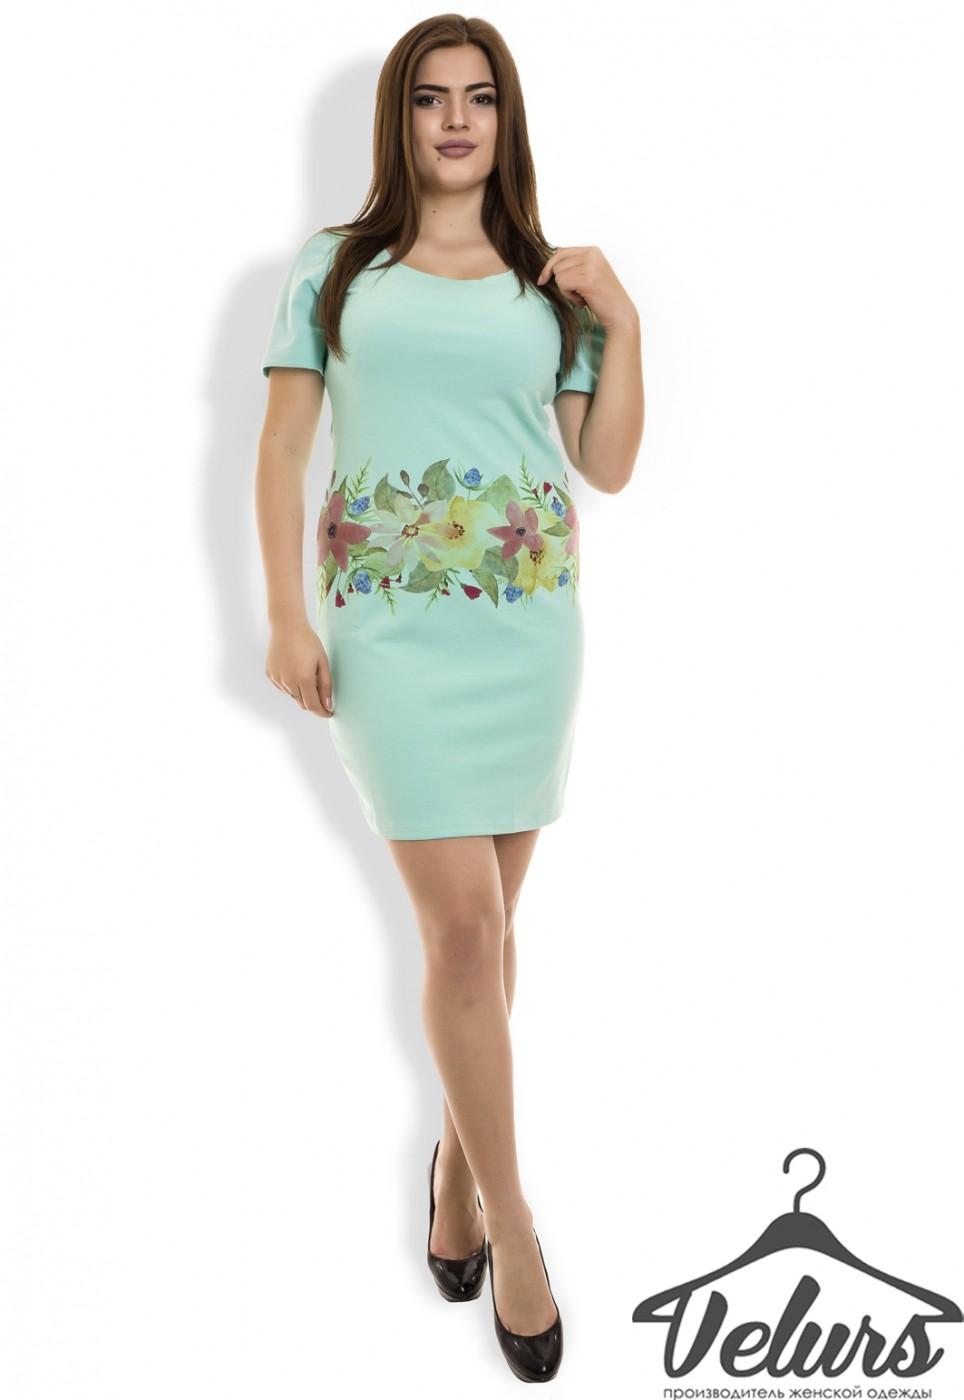 Velurs: Платье 212126 - фото 4